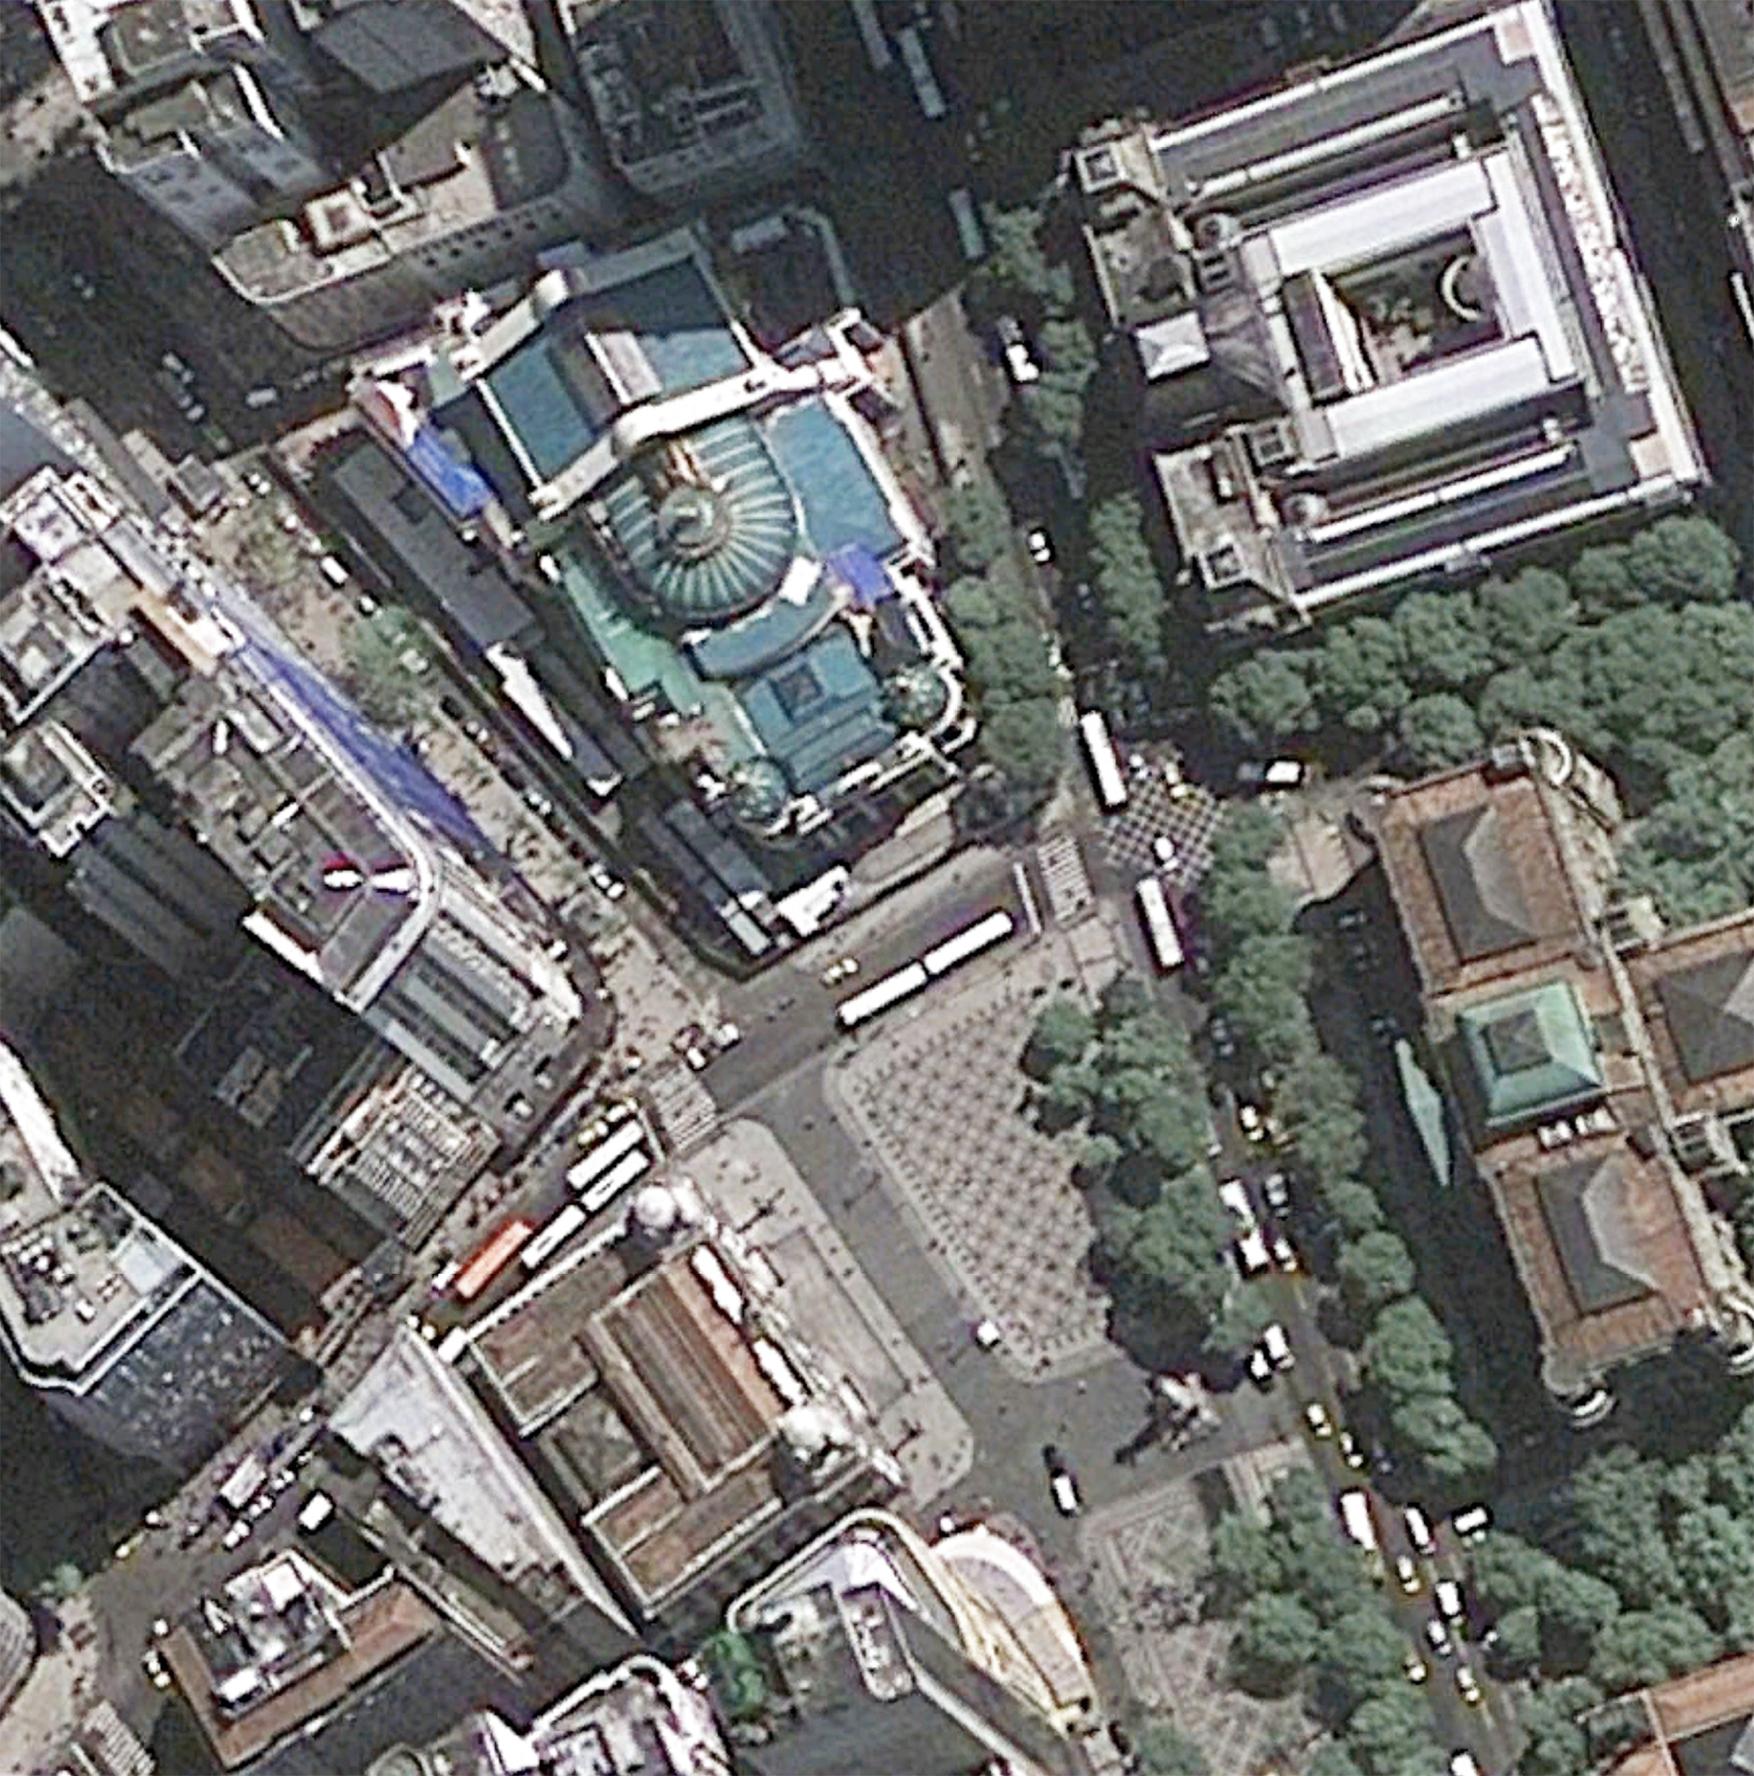 Theatro Municipal Cinelndia Rio De Janeiro Ben Huser Math Wallpaper Golden Find Free HD for Desktop [pastnedes.tk]